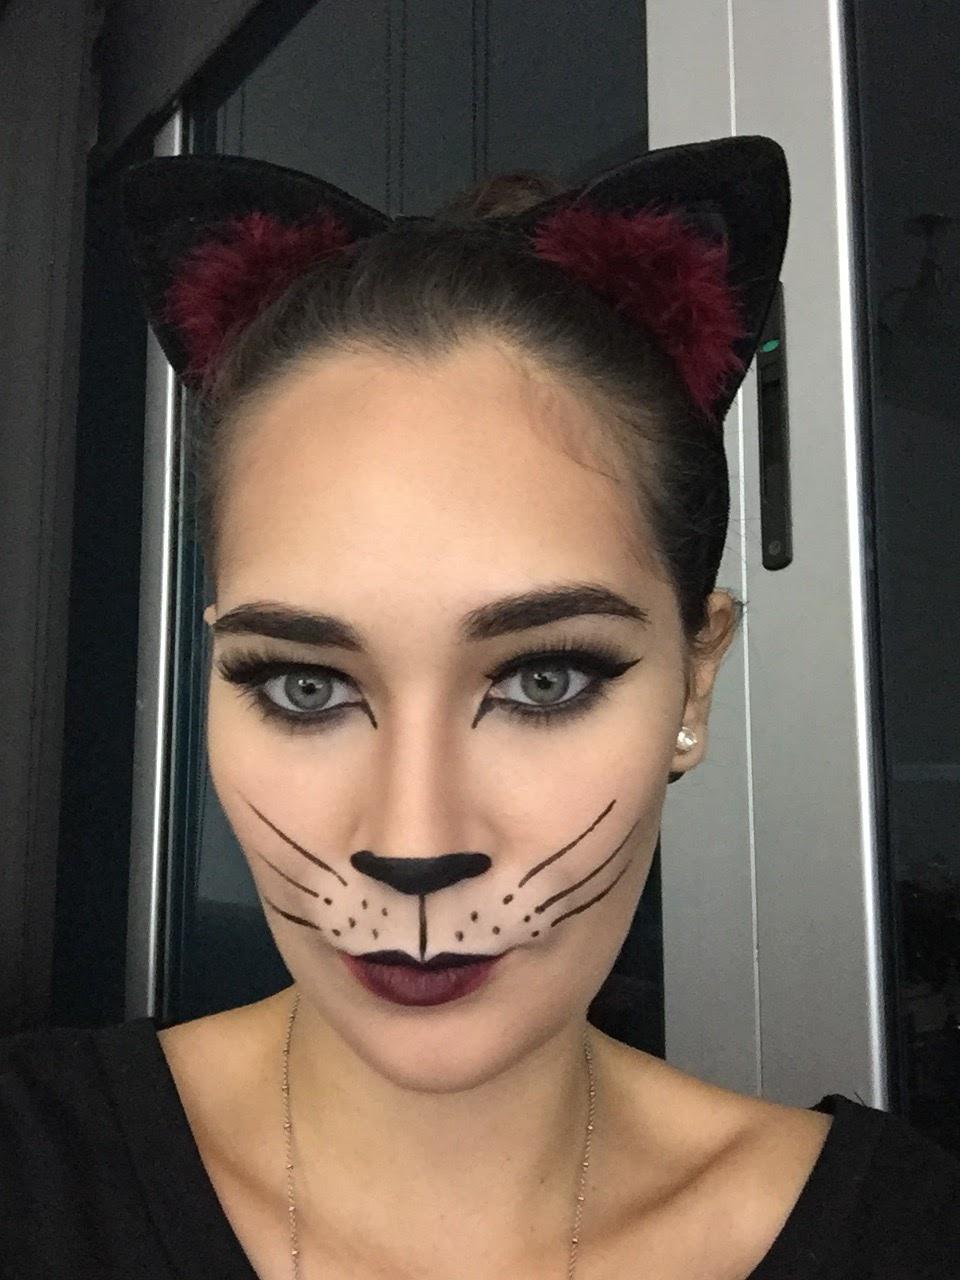 Imagenes Maquillaje De Gata Para Halloween - Disfraz-de-gata-para-halloween